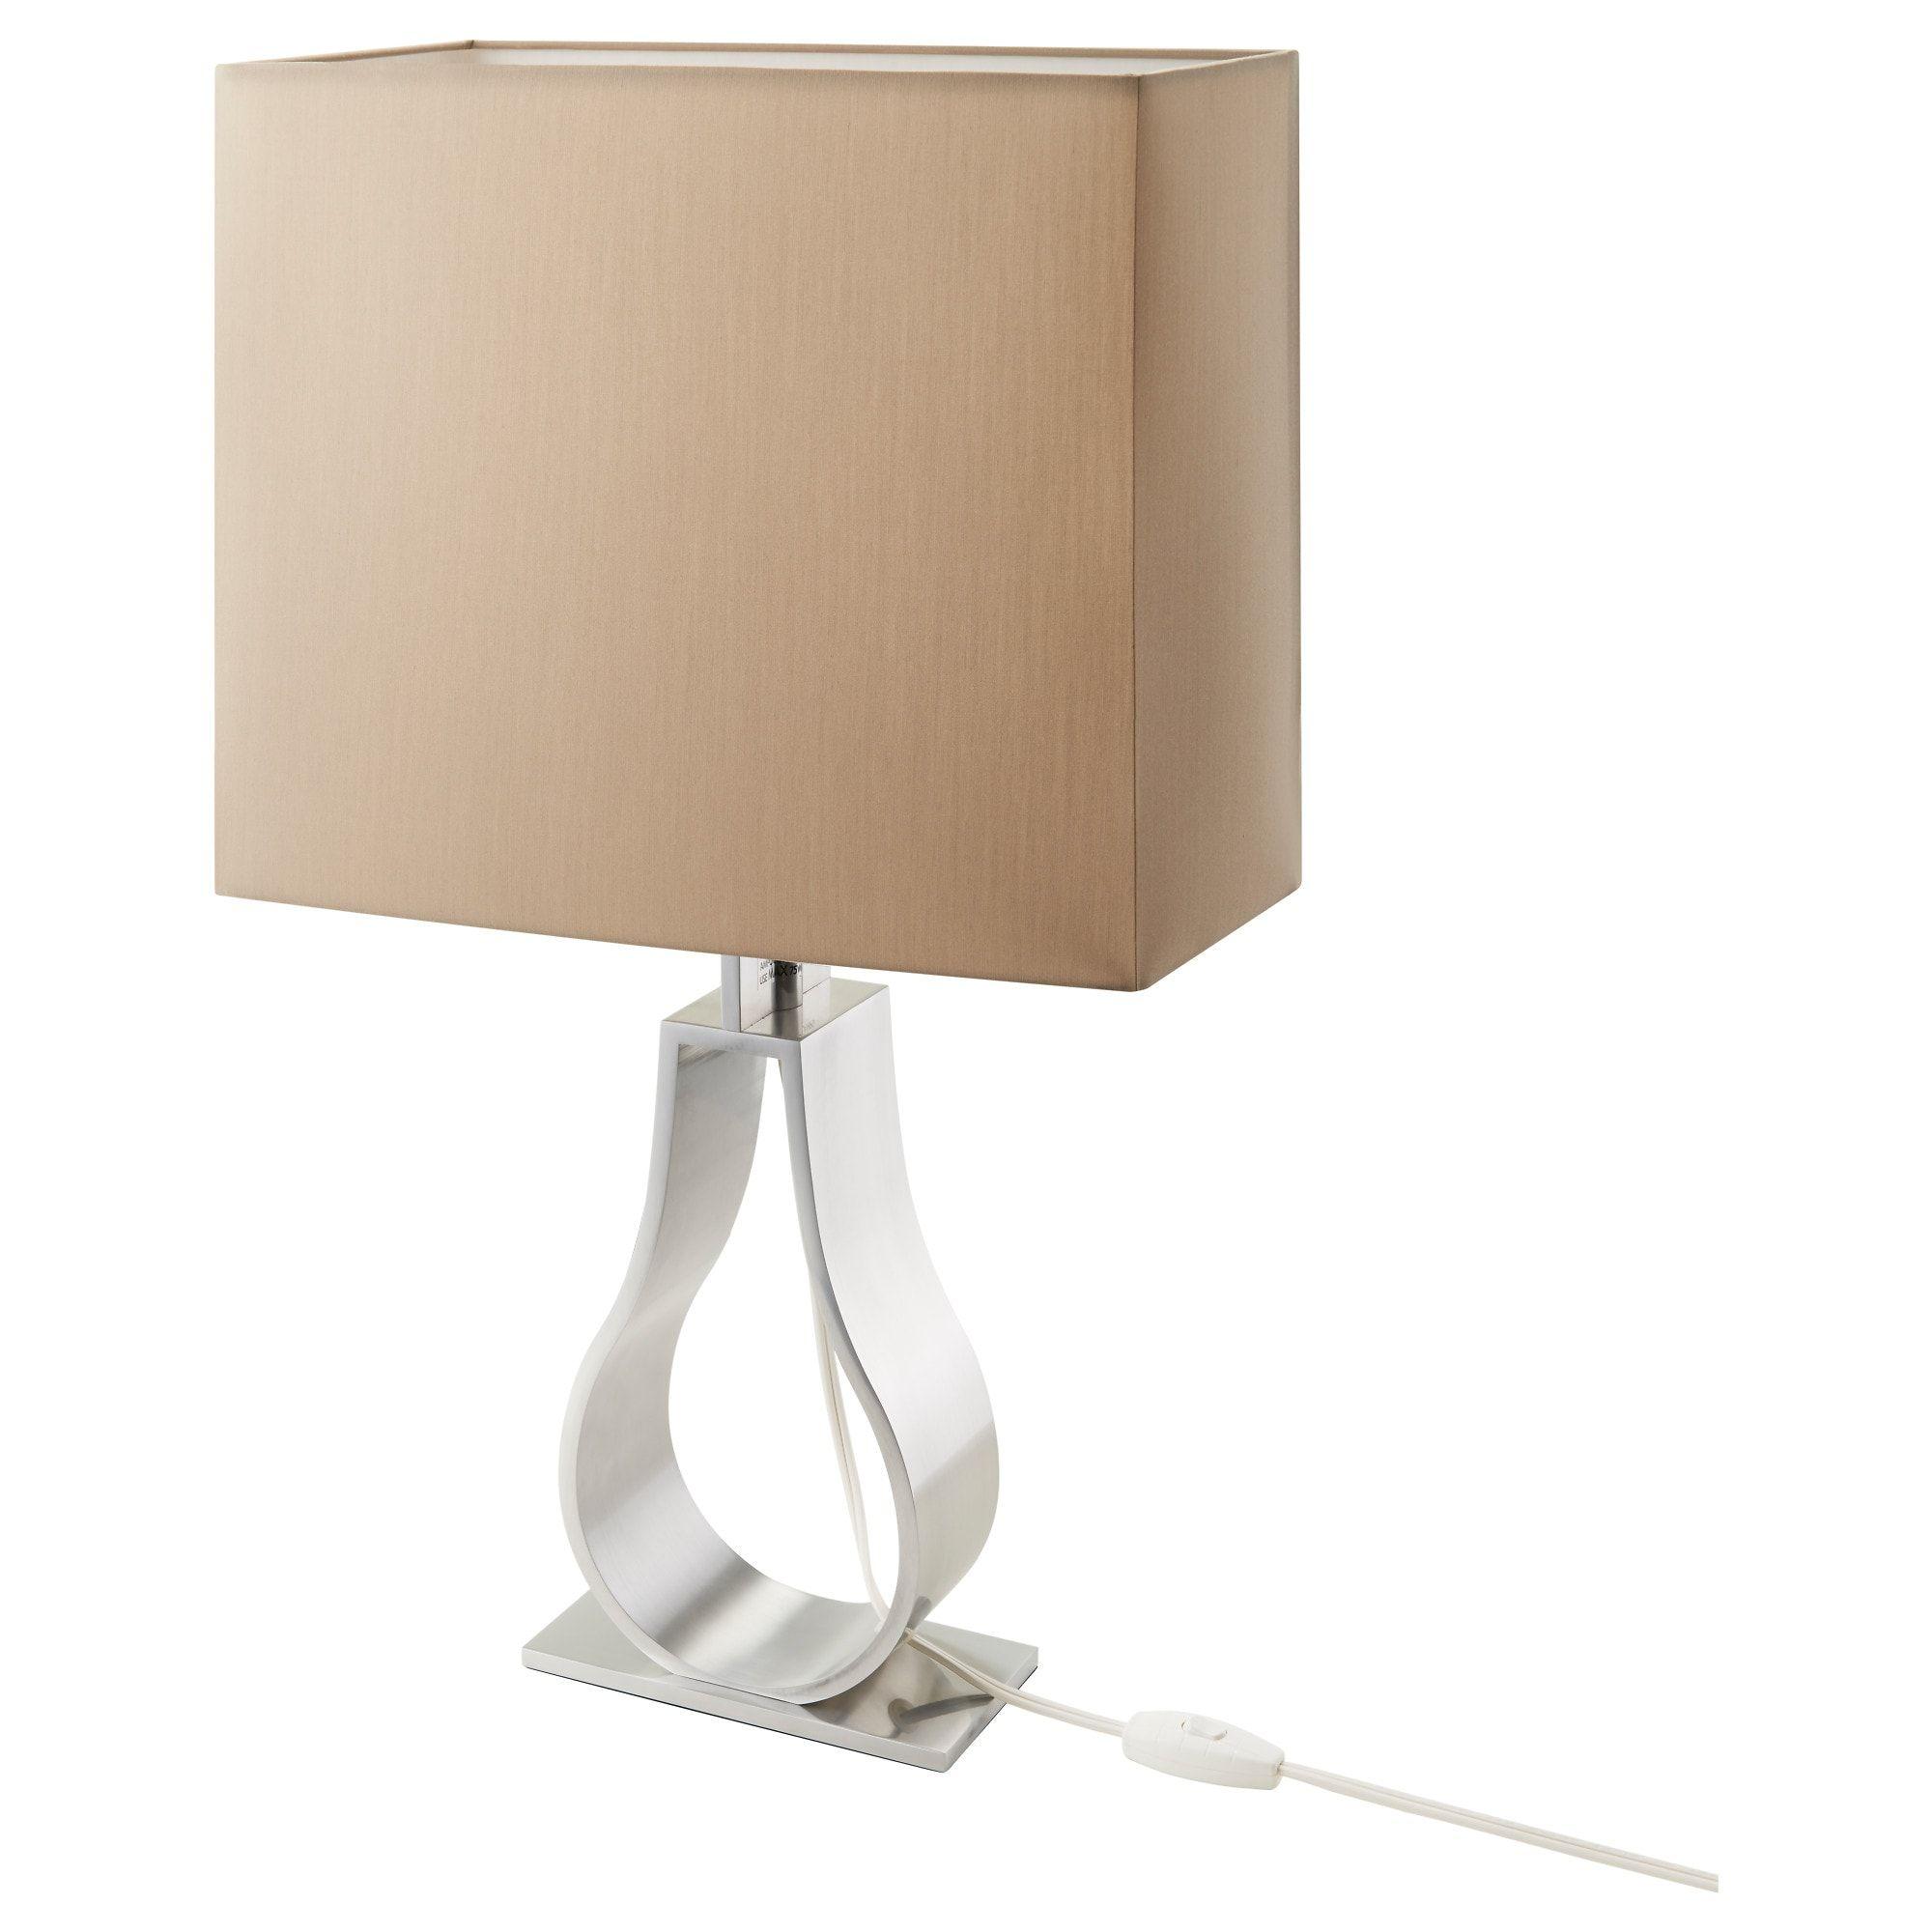 Ikea Klabb Light Brown Nickel Plated Table Lamp With Led Bulb Table Lamp Floor Lamp Room Lamp